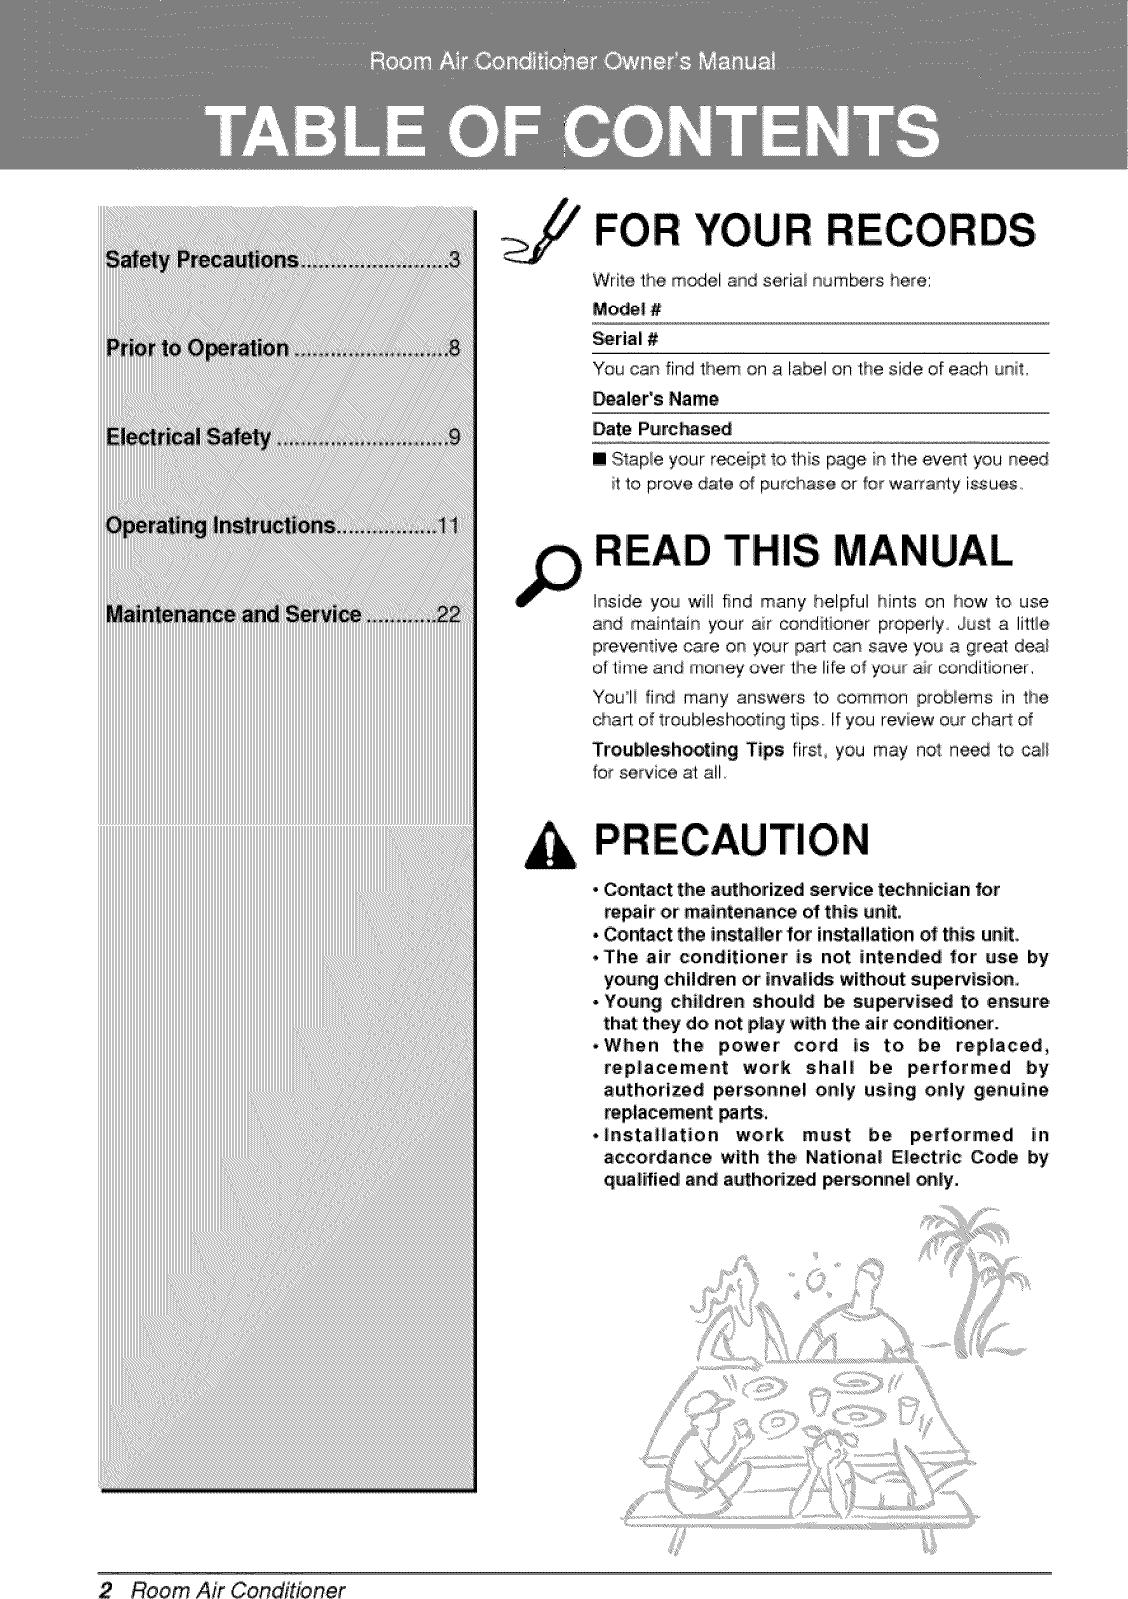 LG LSC091PMA User Manual ROOM A/C Manuals And Guides 1006355L